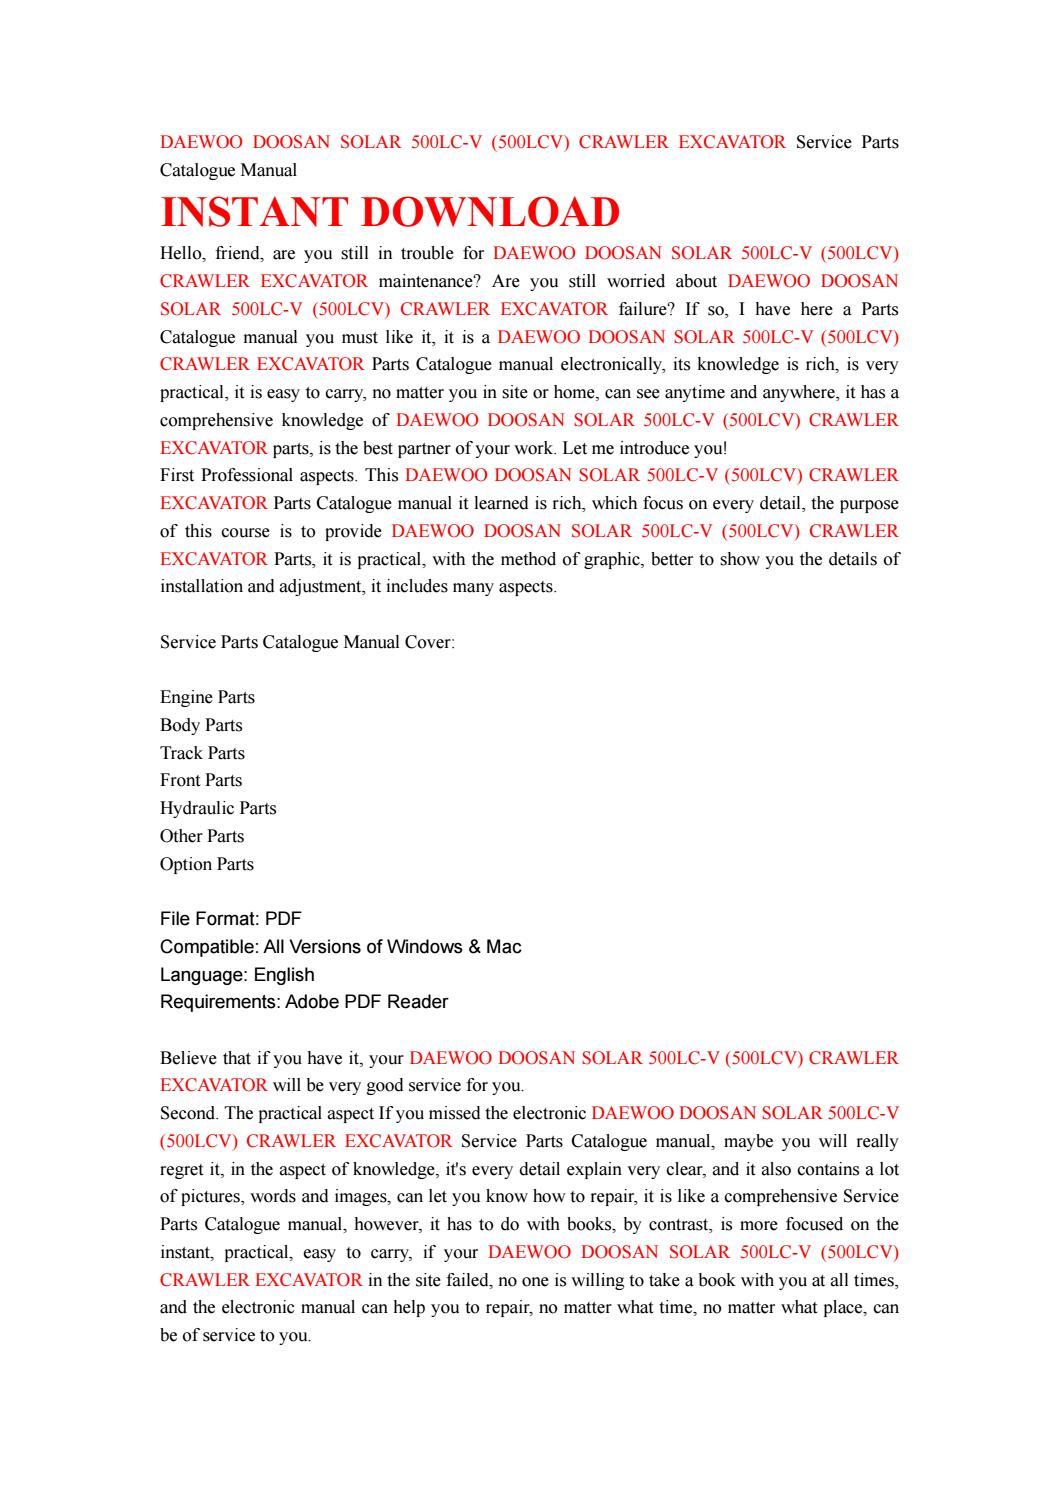 Daewoo doosan solar 500lc v (500lcv) crawler excavator service parts  catalogue manual by kjjsefhsjef - issuu